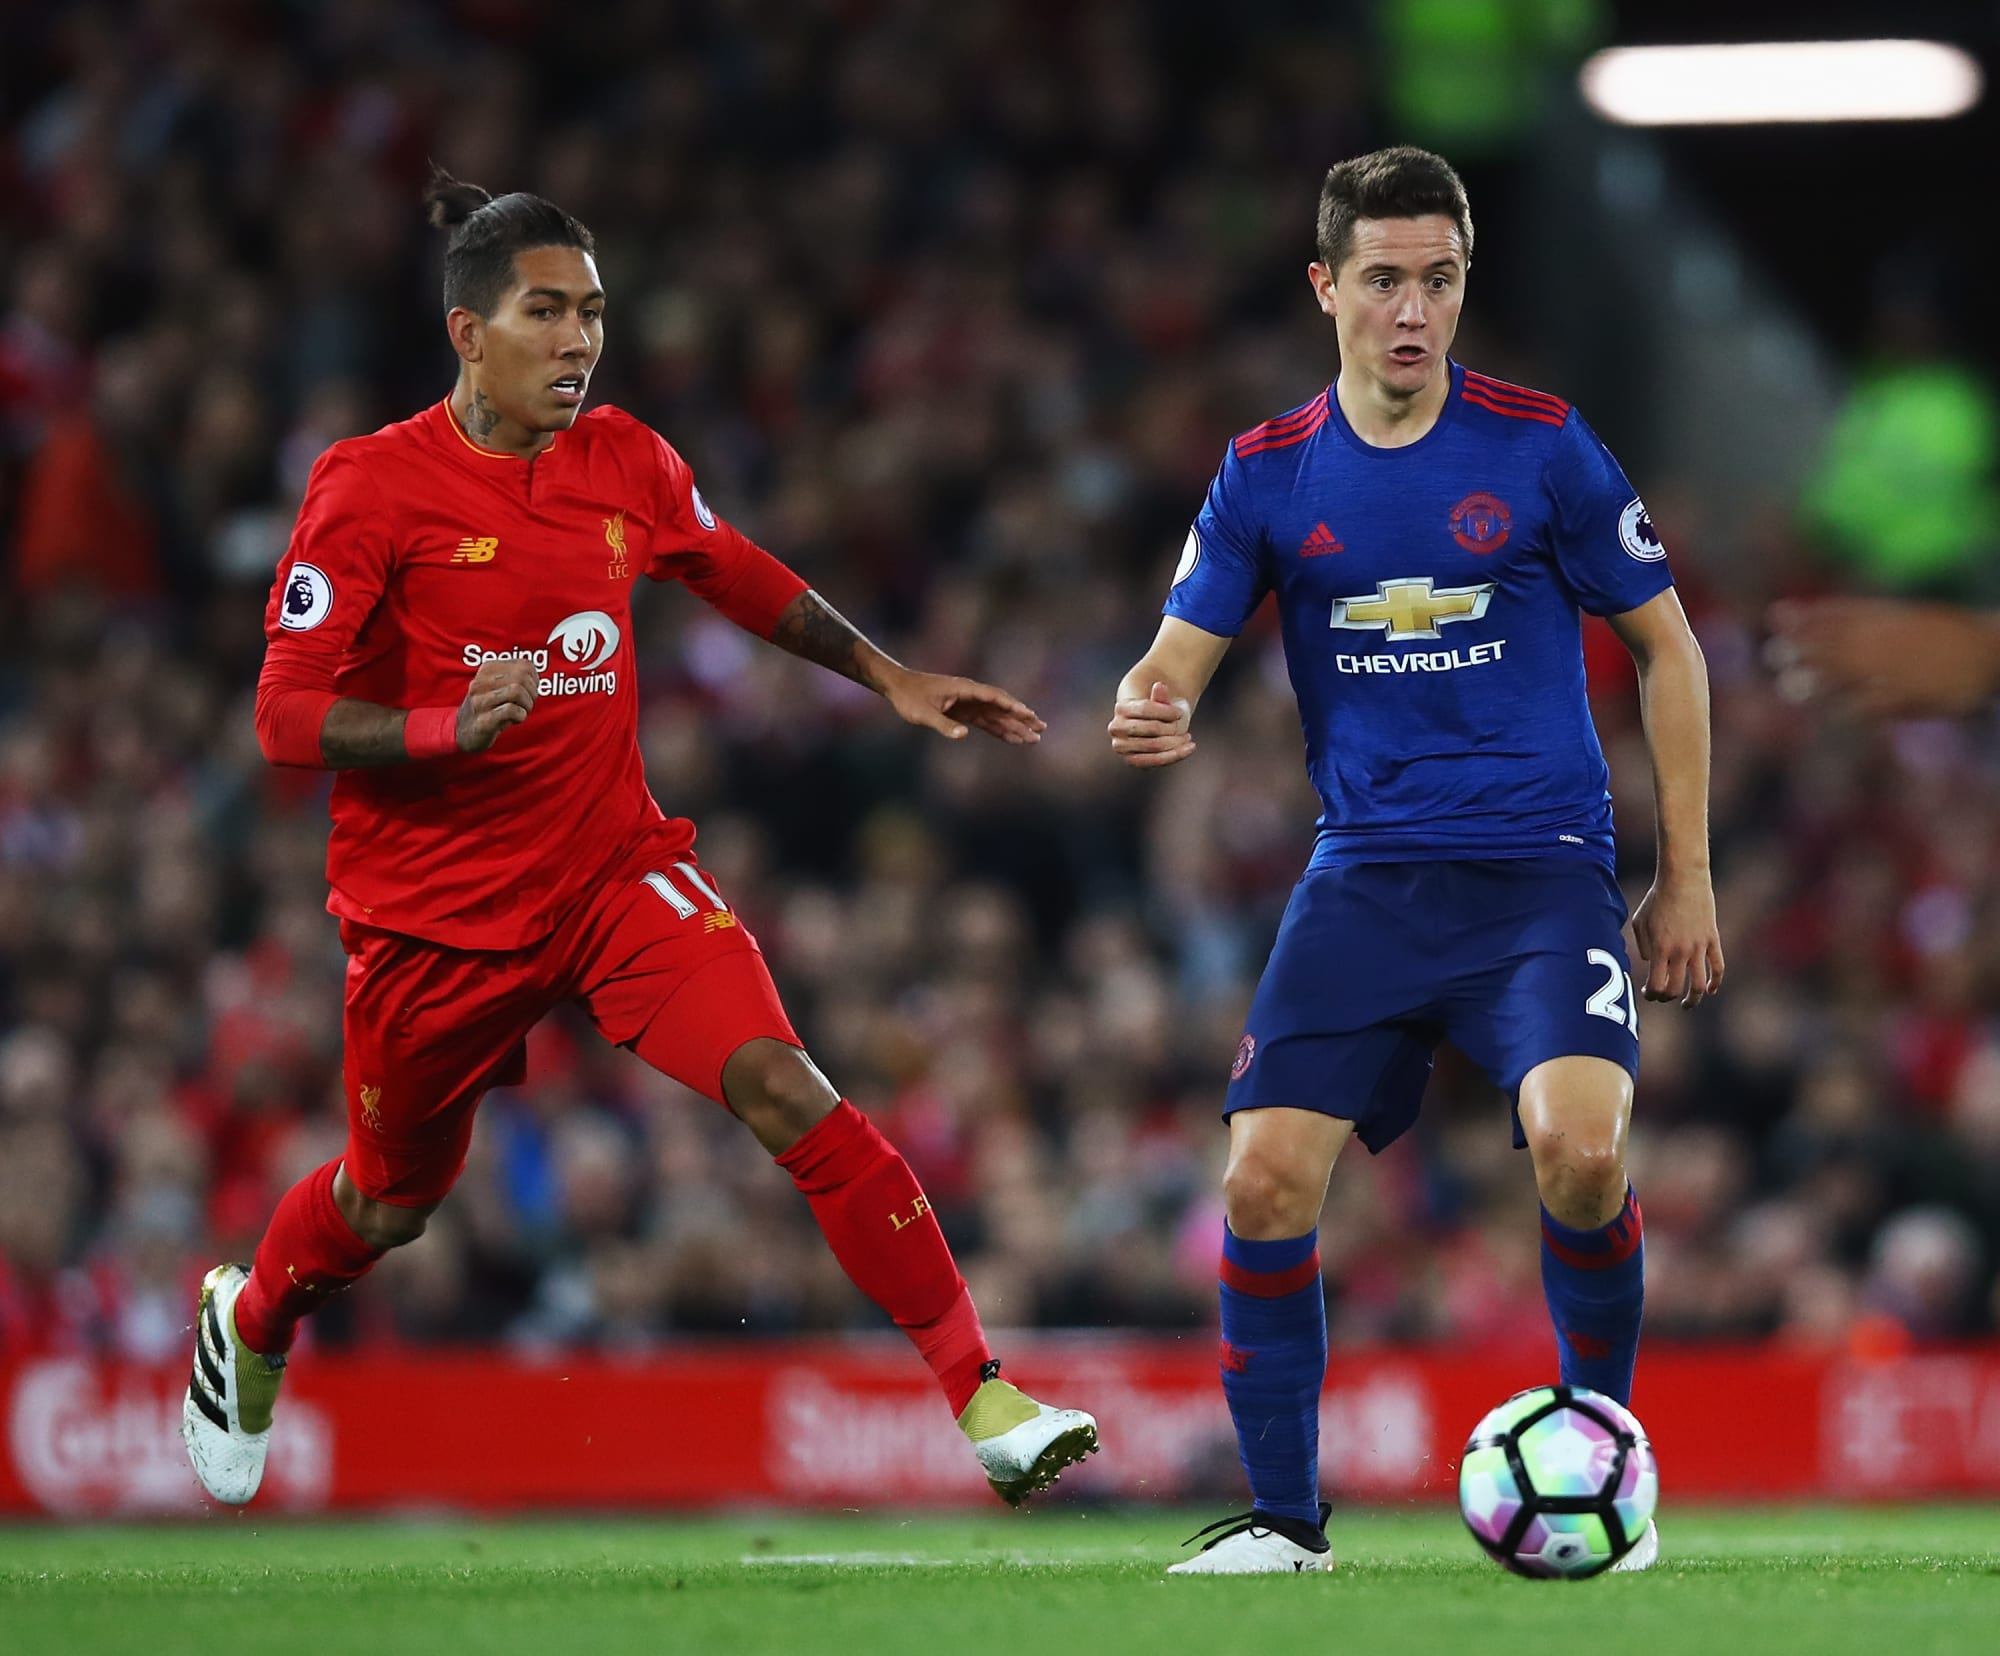 Manchester United v Liverpool: Herrera's chance to show ...